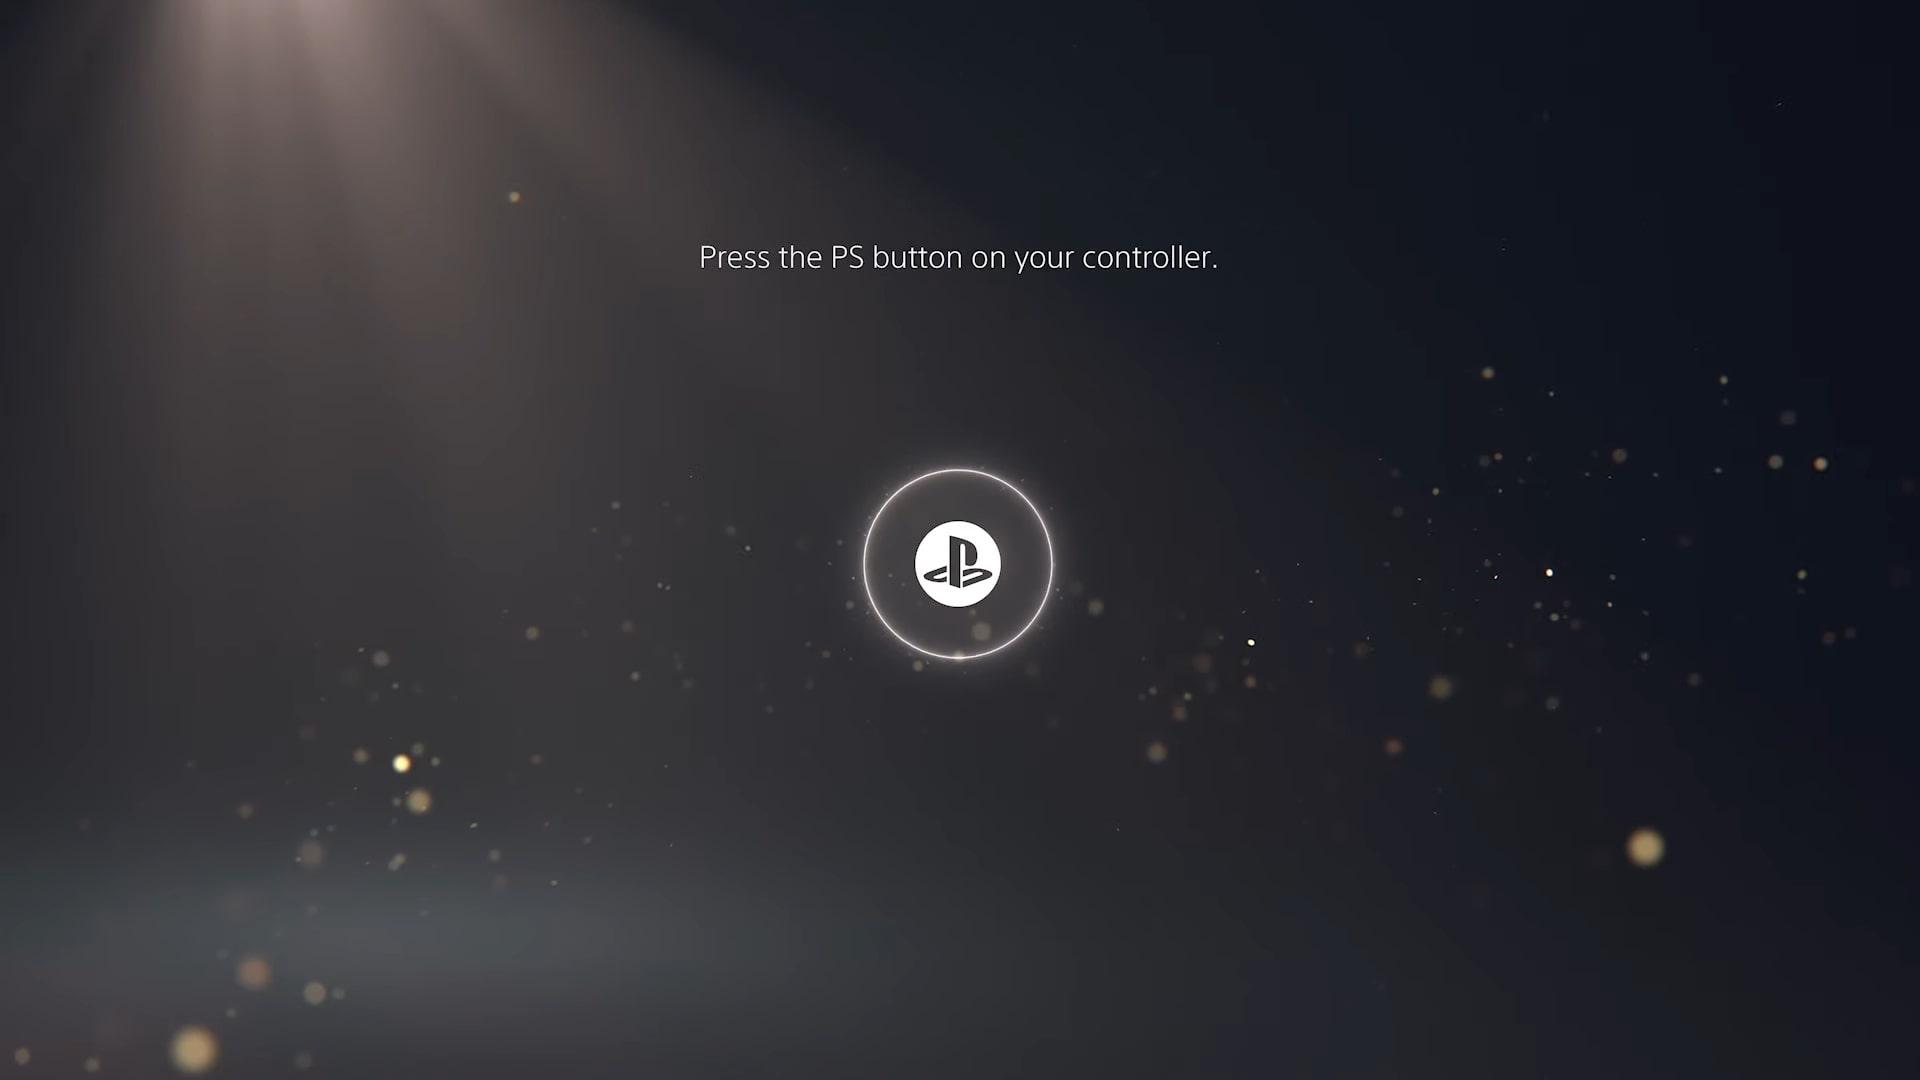 PS5 UI Finally Revealed